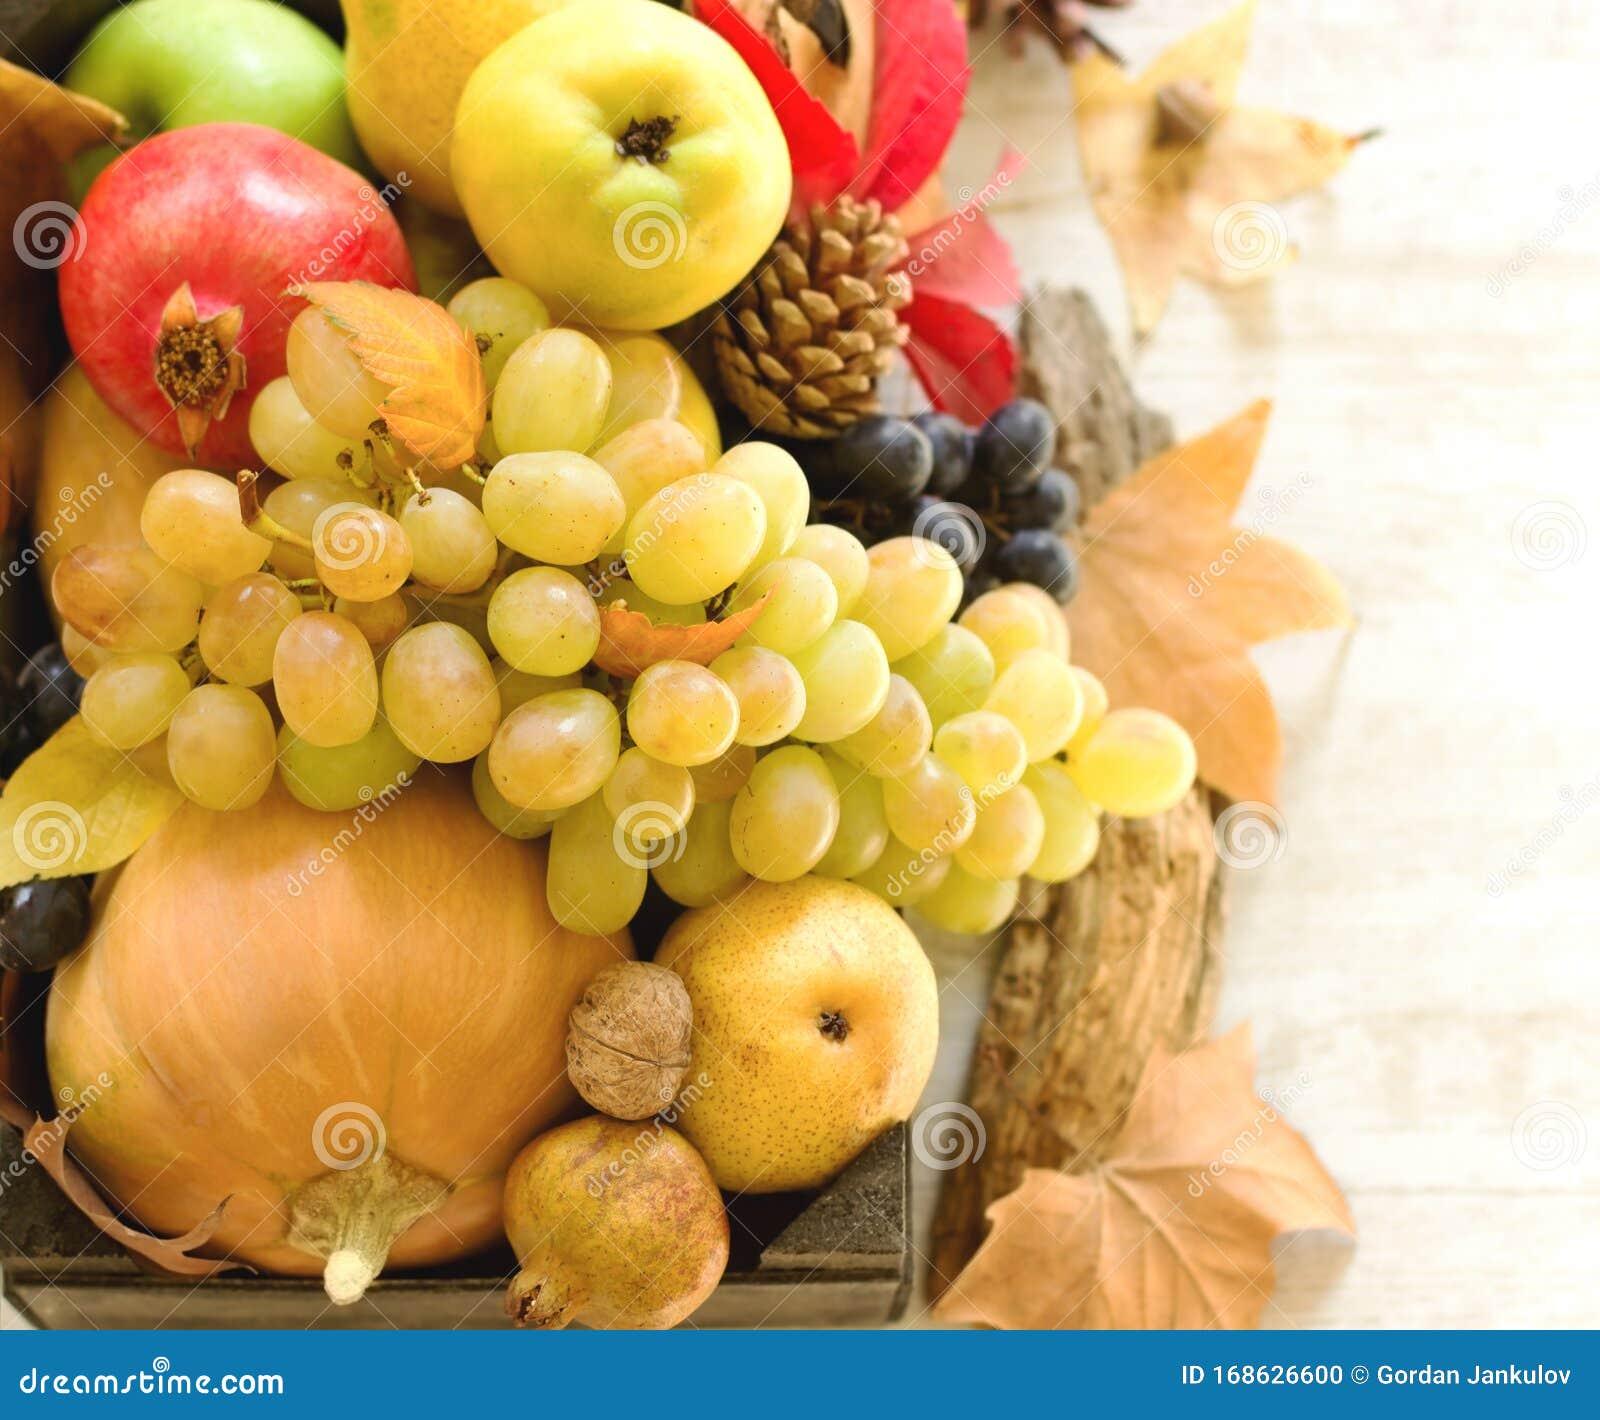 Seasonal Organic Fruit And Vegetable In Crate Closeup Stock Photo Image Of Season Closeup 168626600